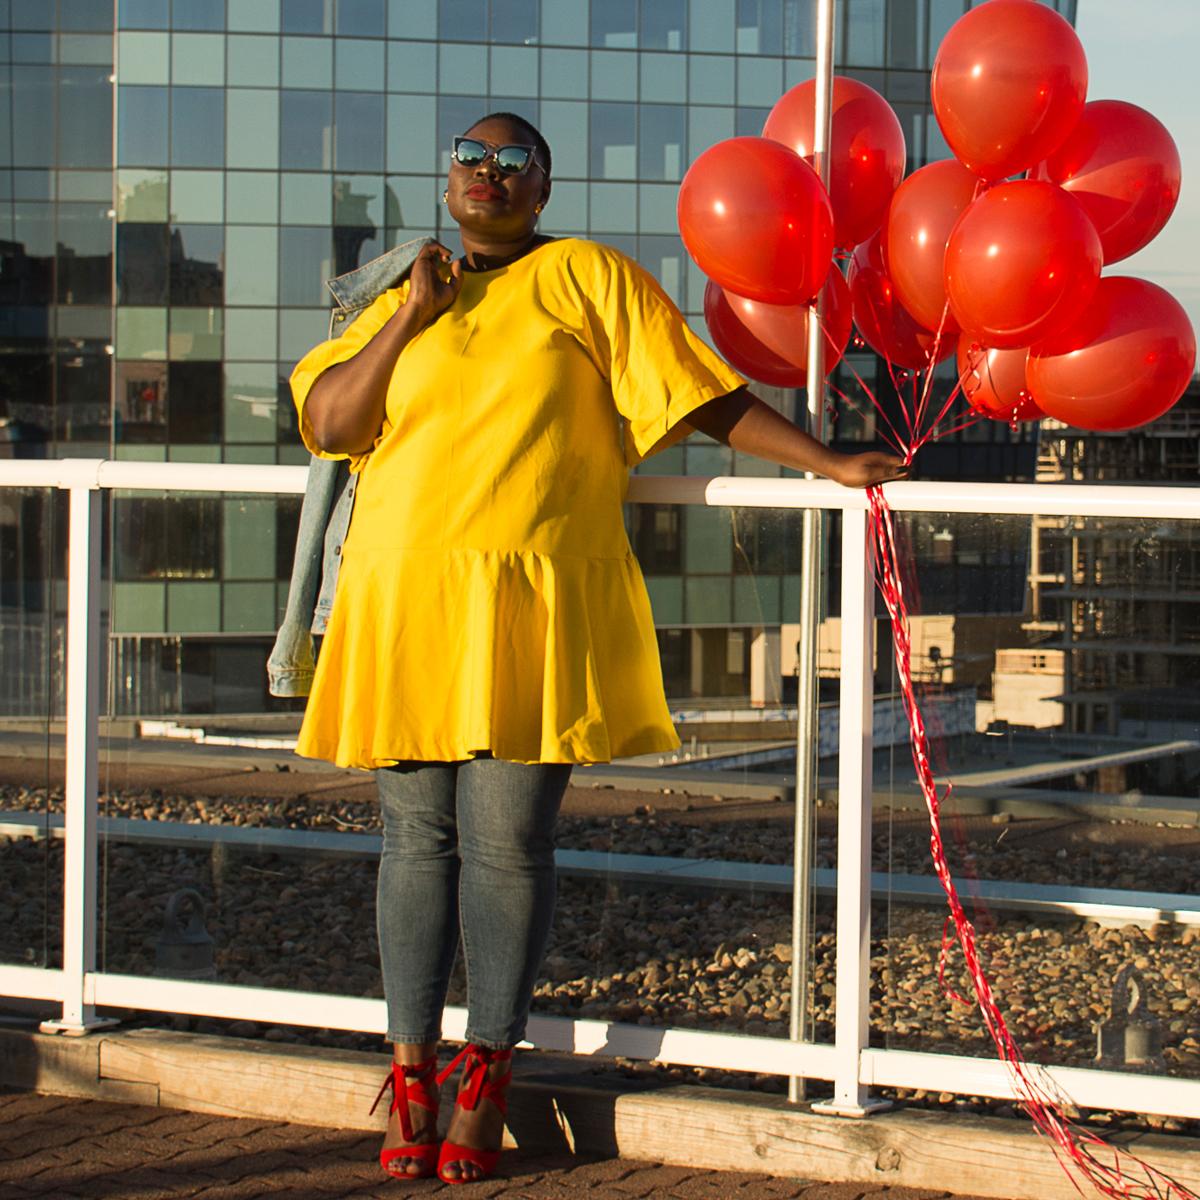 celebrating life, yellow dress, red shoes, balloon shoot carol mcallister 04